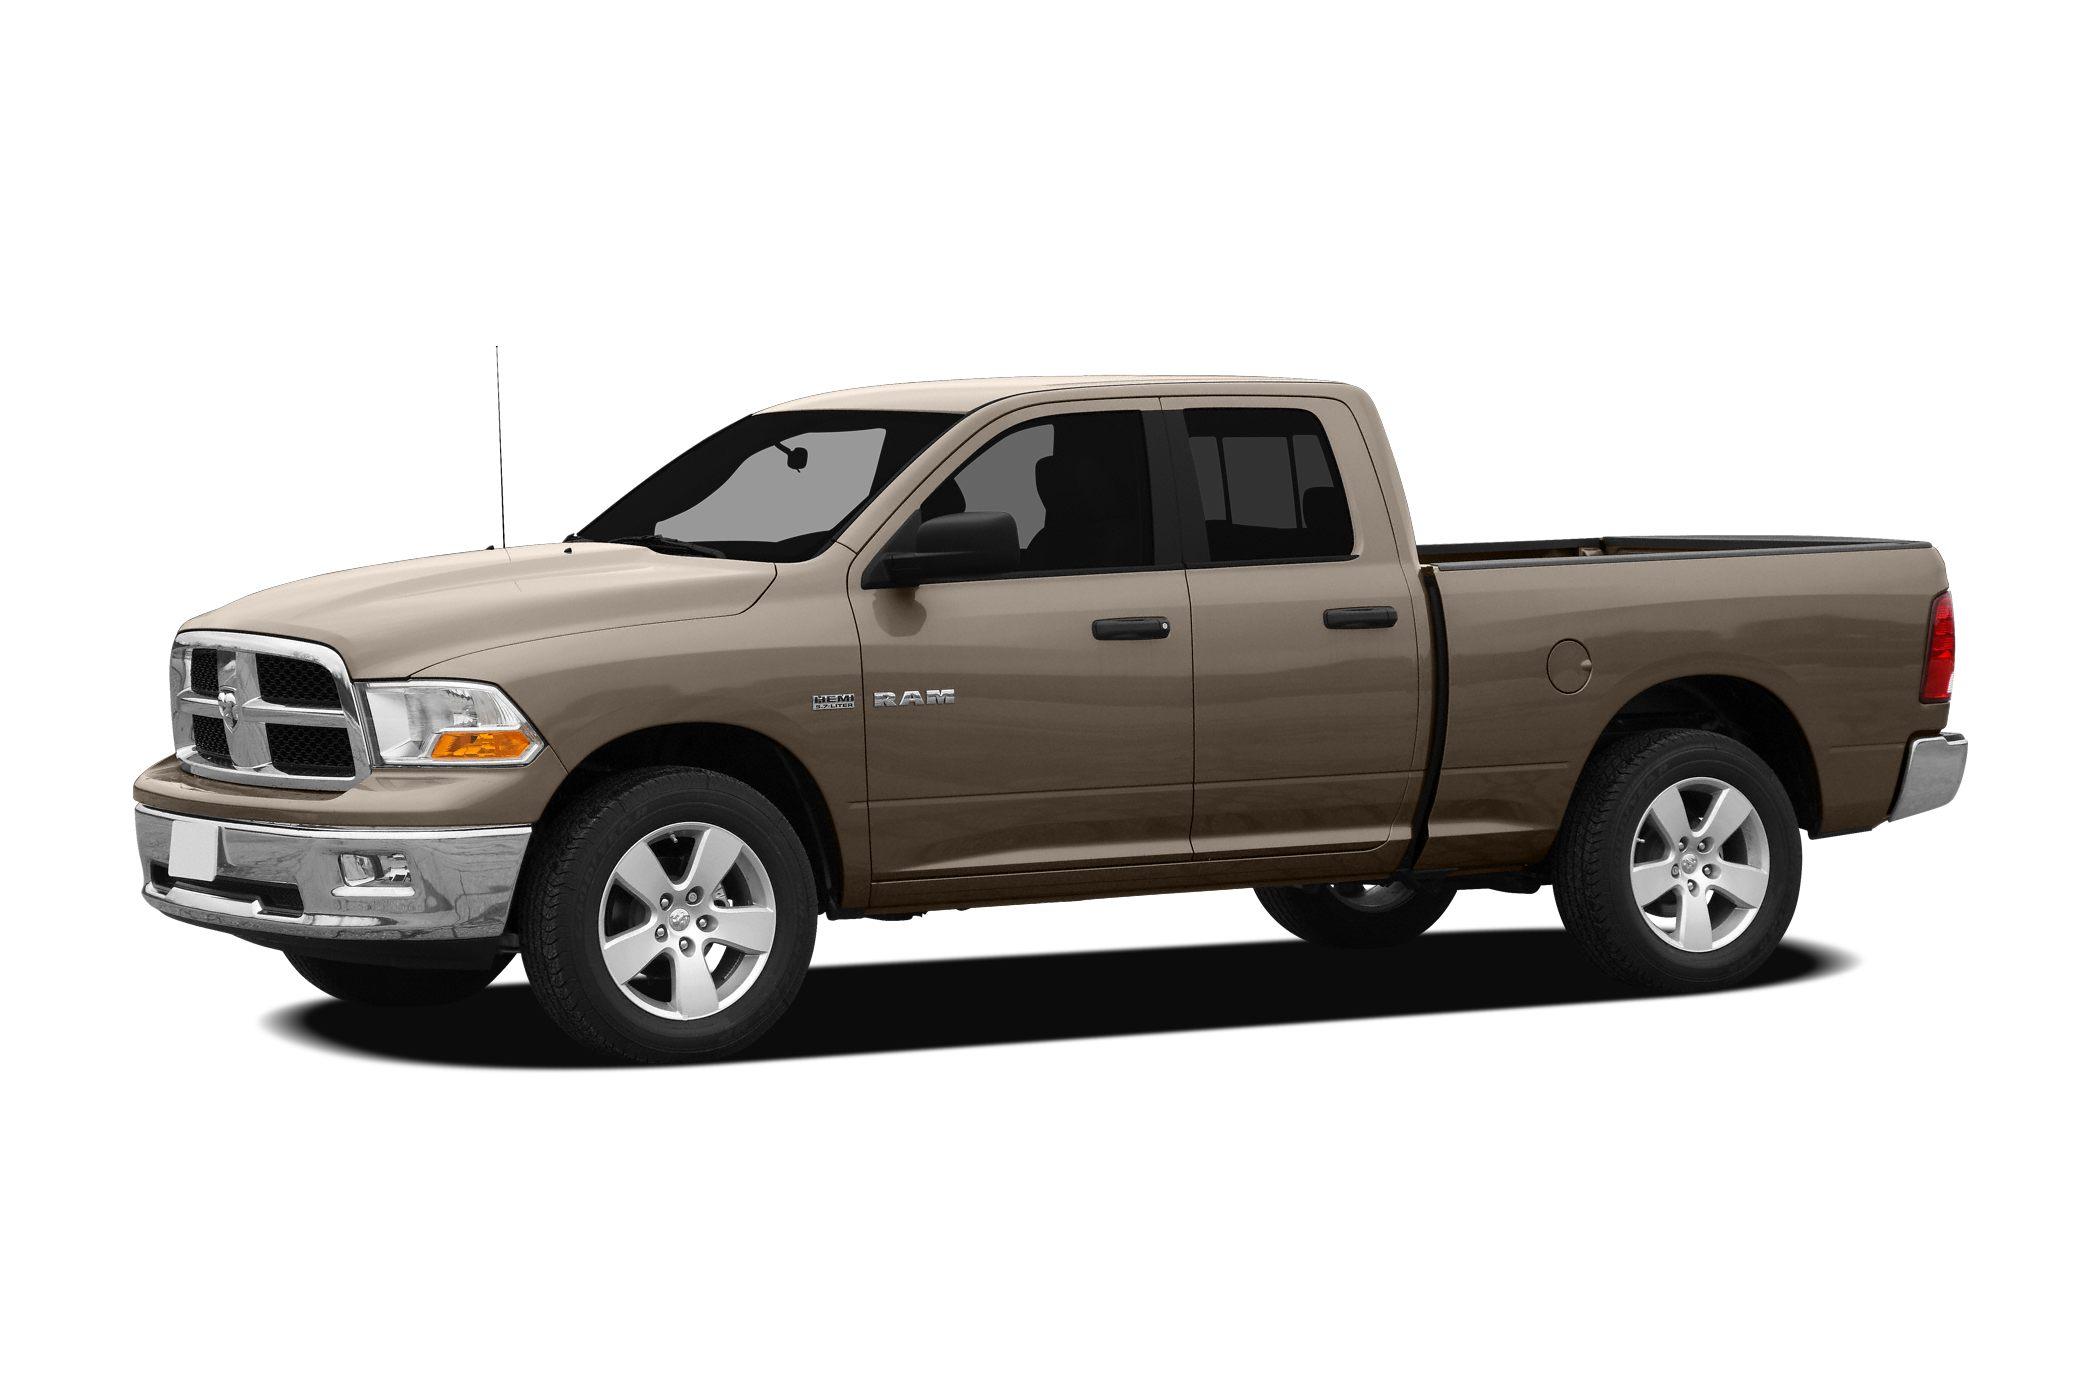 2009 Dodge Ram 1500 LARAMIESL Miles 66442Color Red Stock 18869 VIN 1D3HV18T69S816096